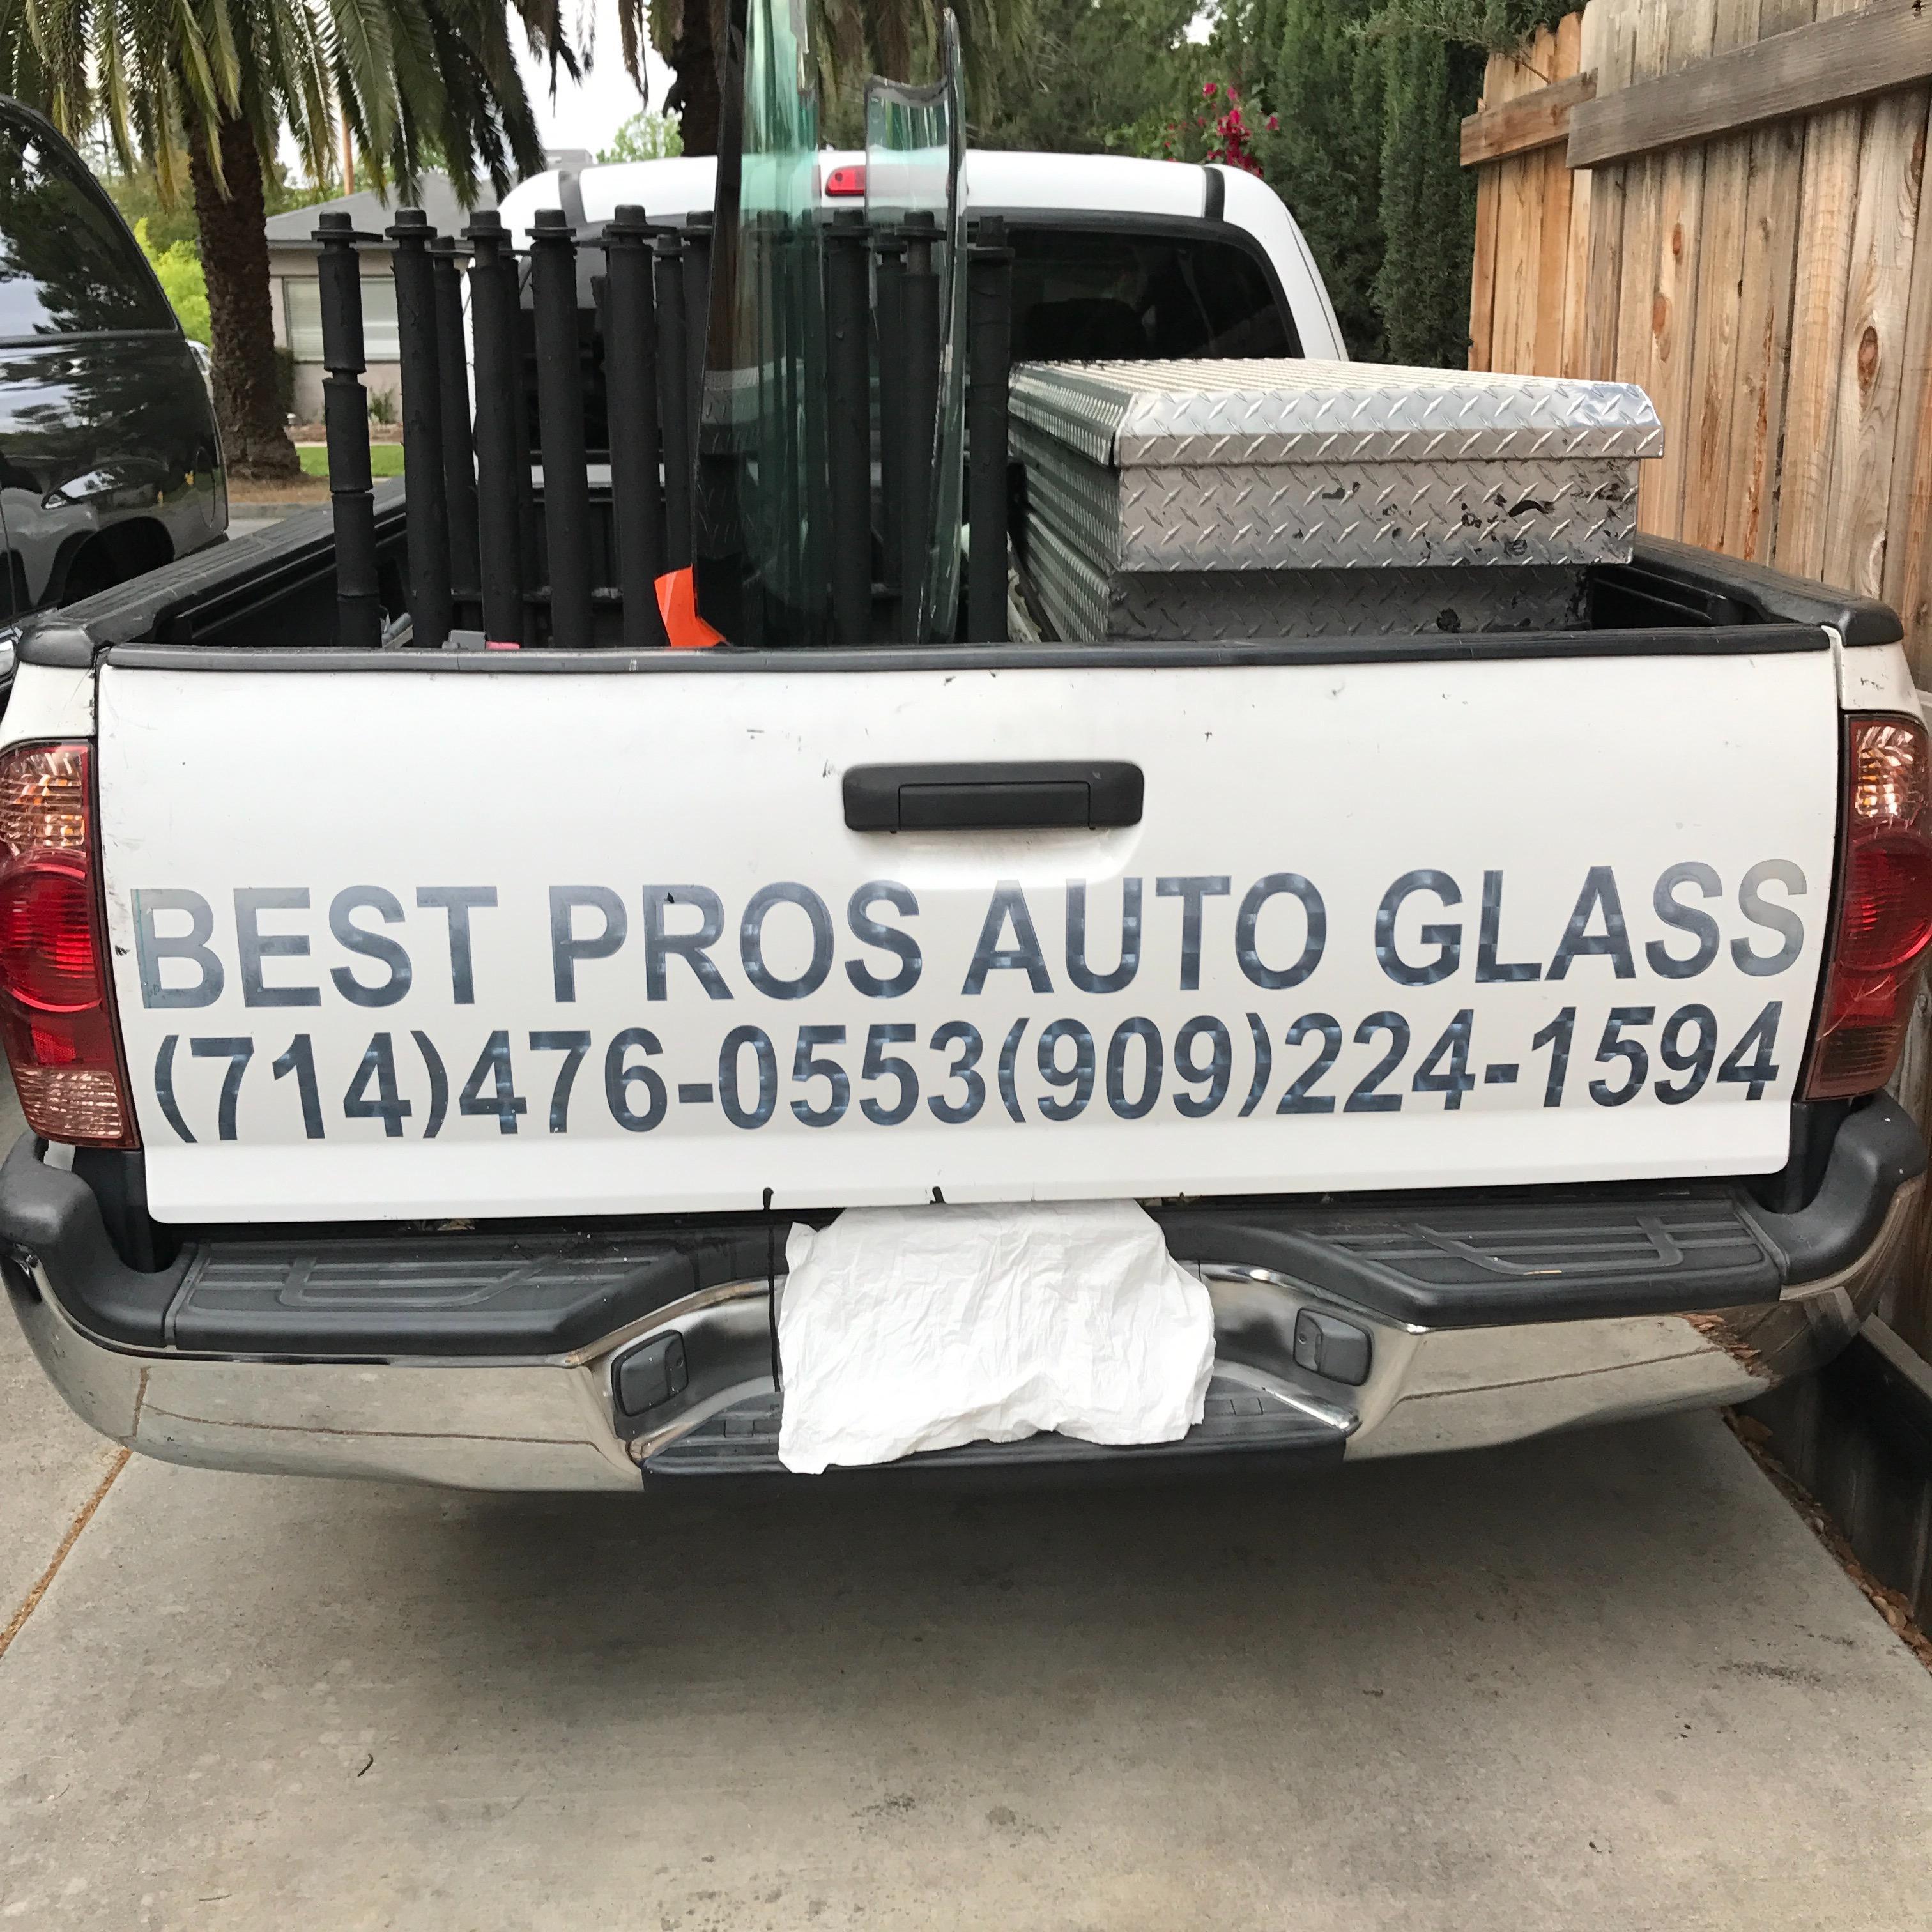 Best Pros Auto Glass image 8